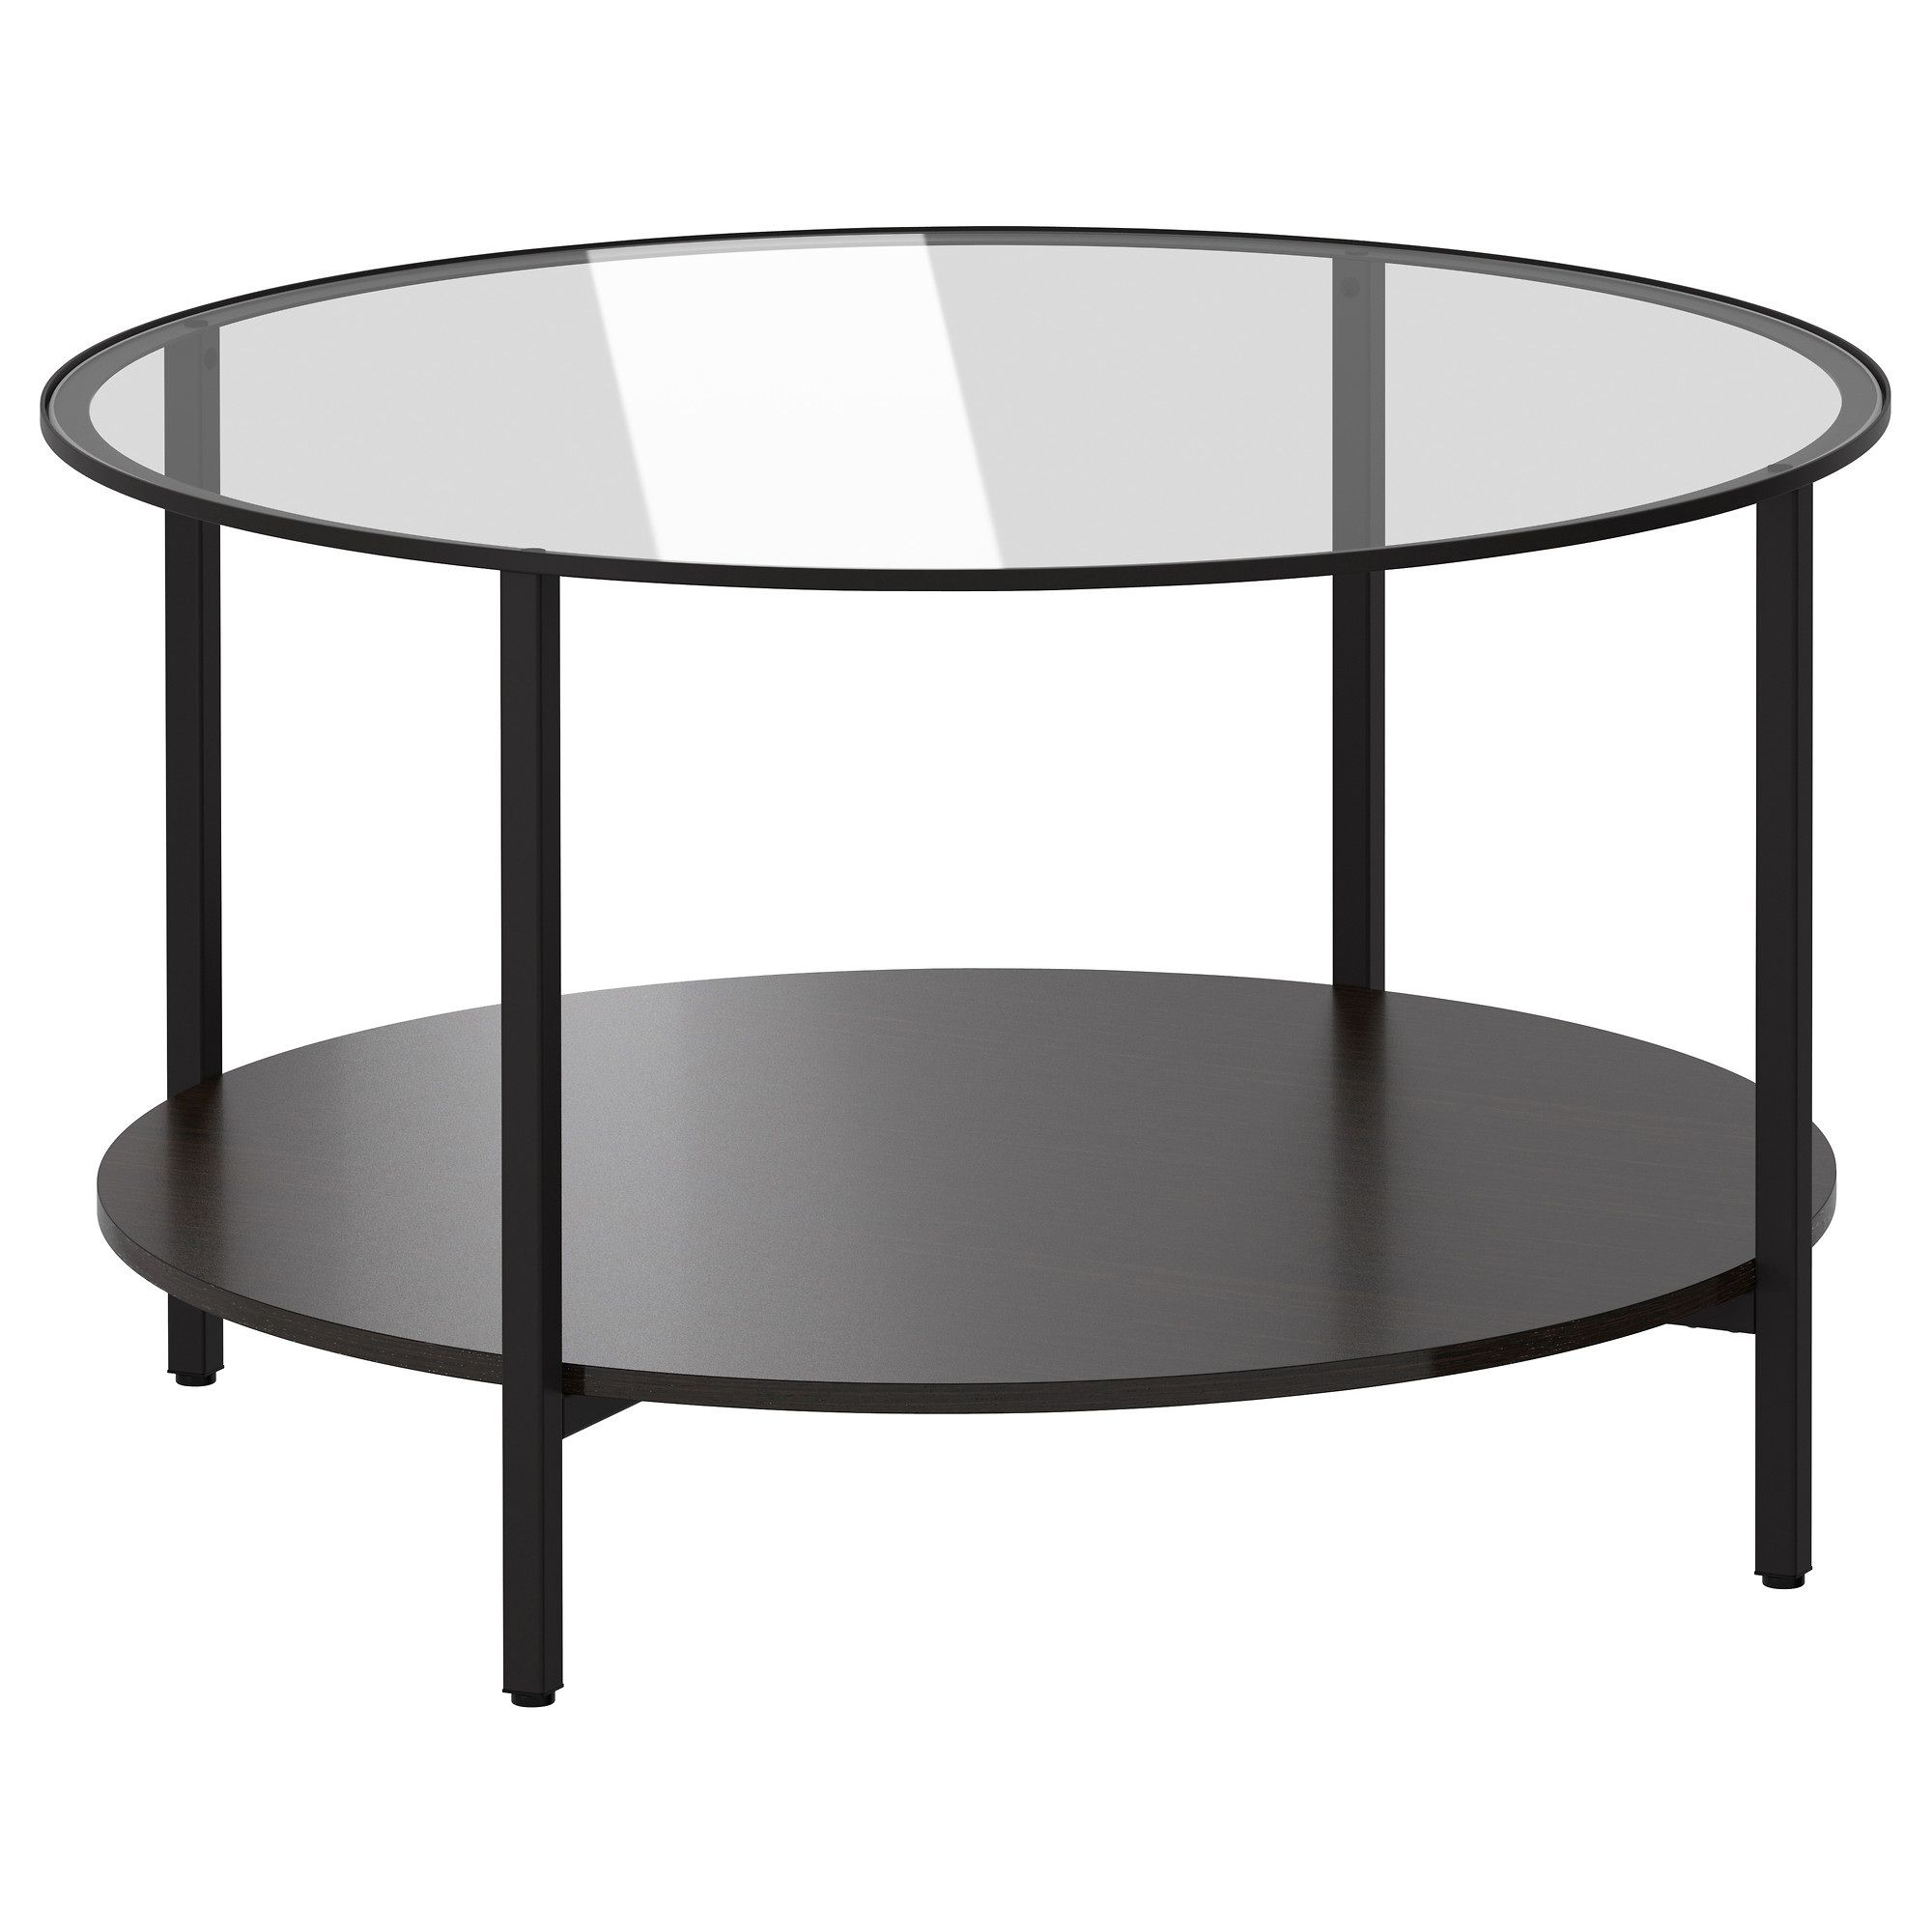 20 Round Glass Coffee Table Ikea Used Home fice Furniture